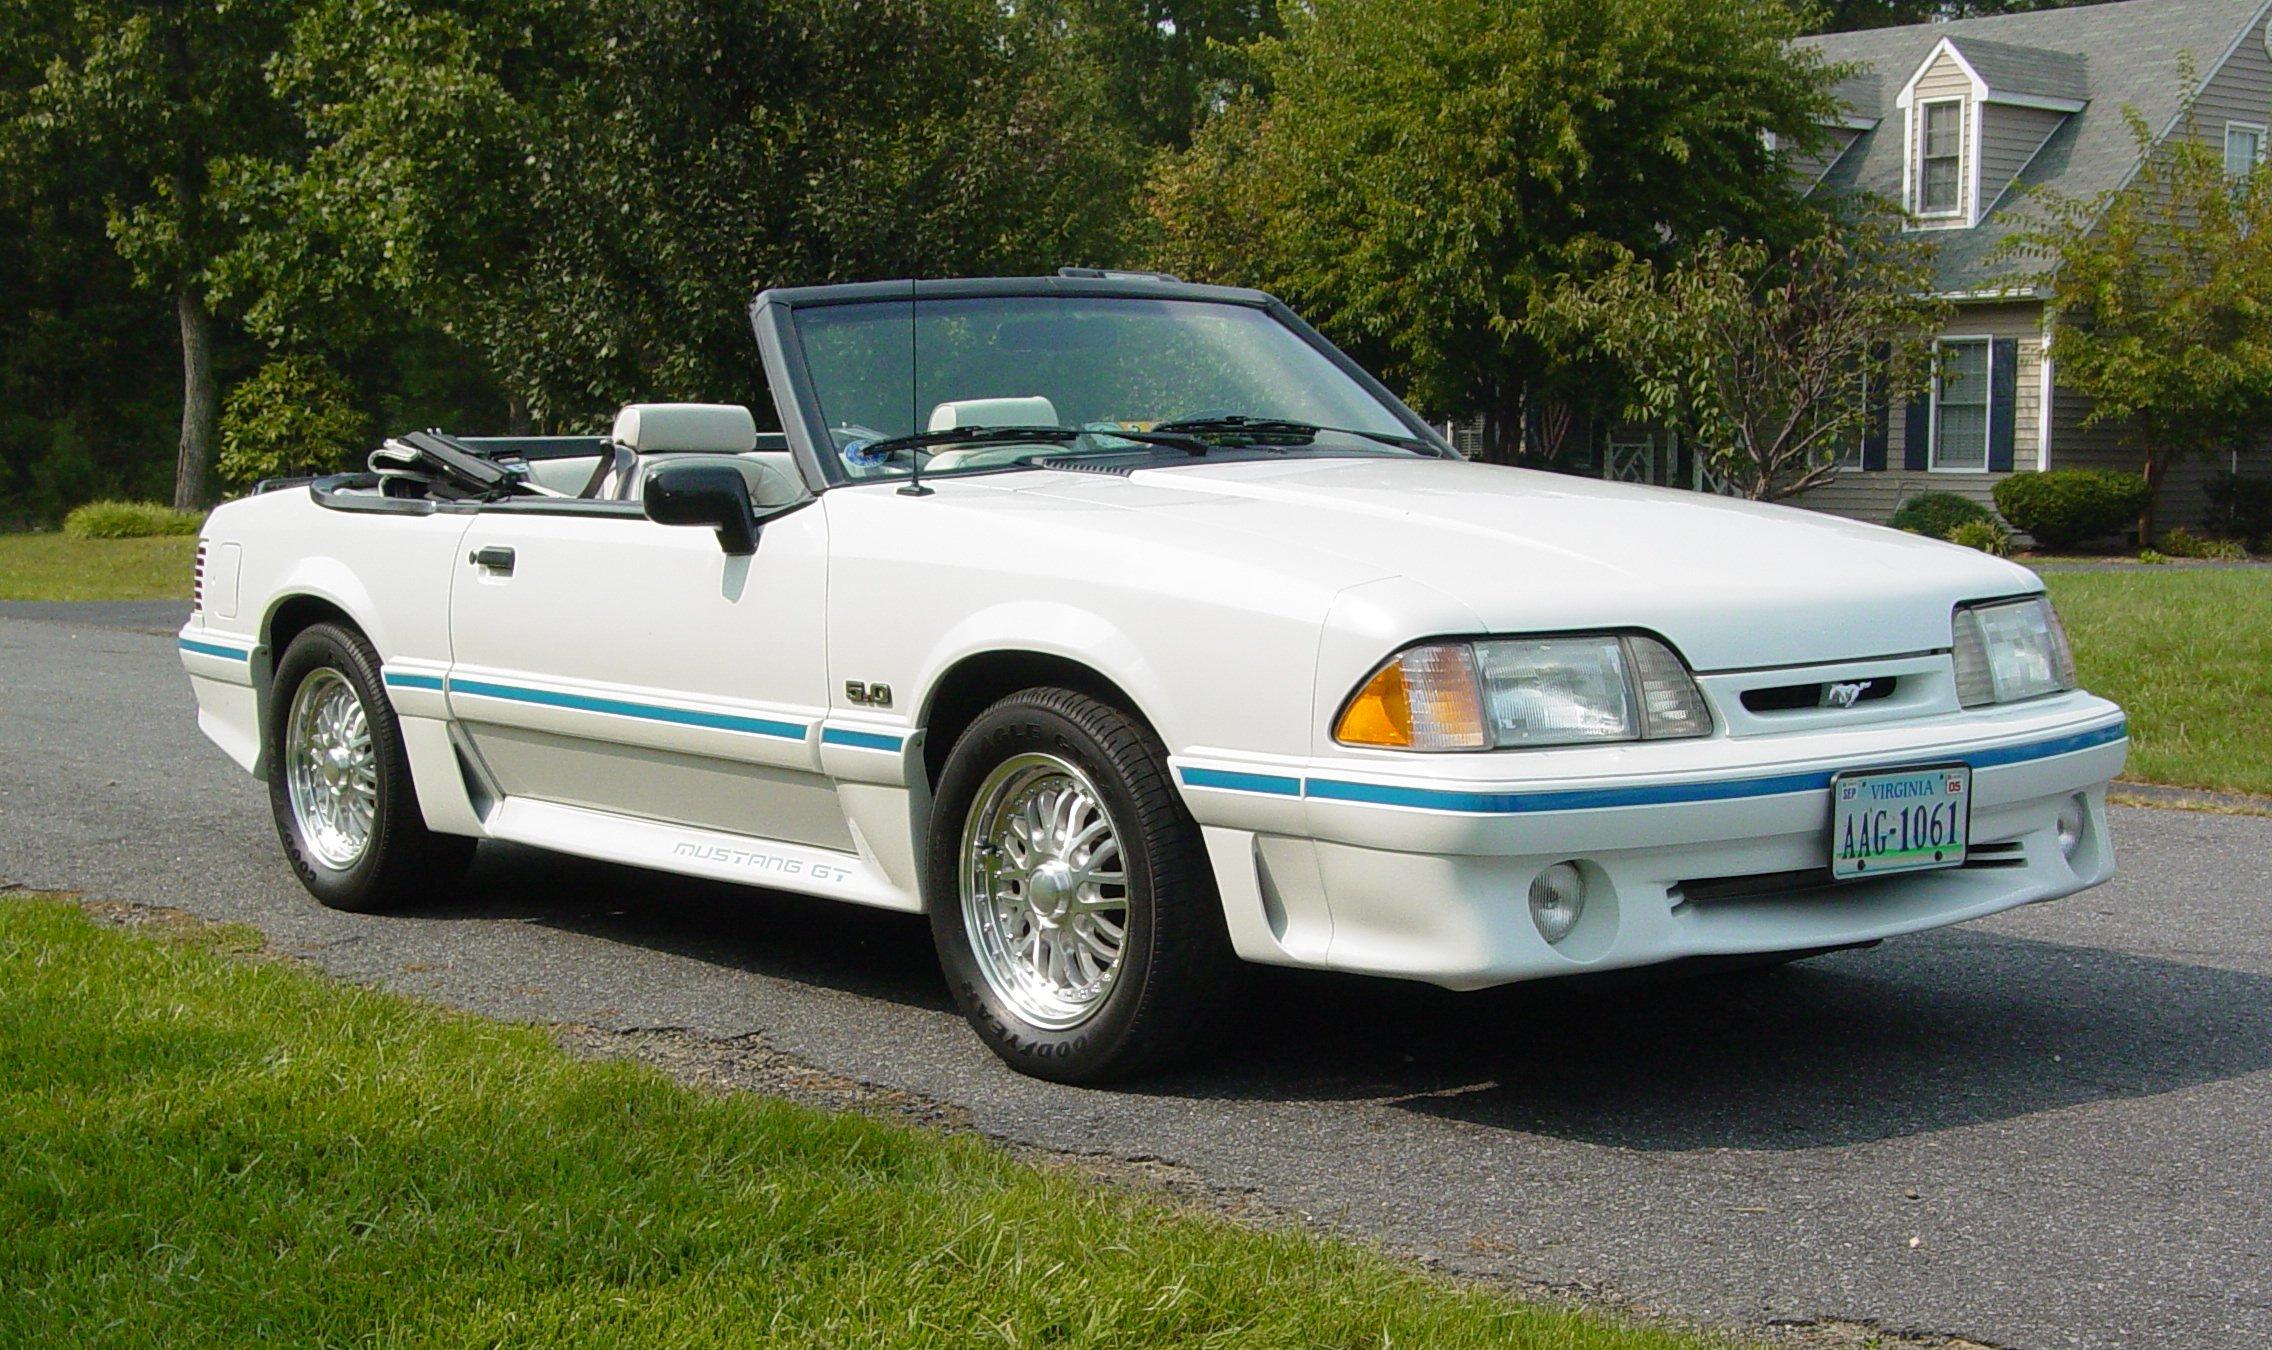 Archivo Ford Mustang Gt Convertible Third Generation Jpg Wikipedia La Enciclopedia Libre